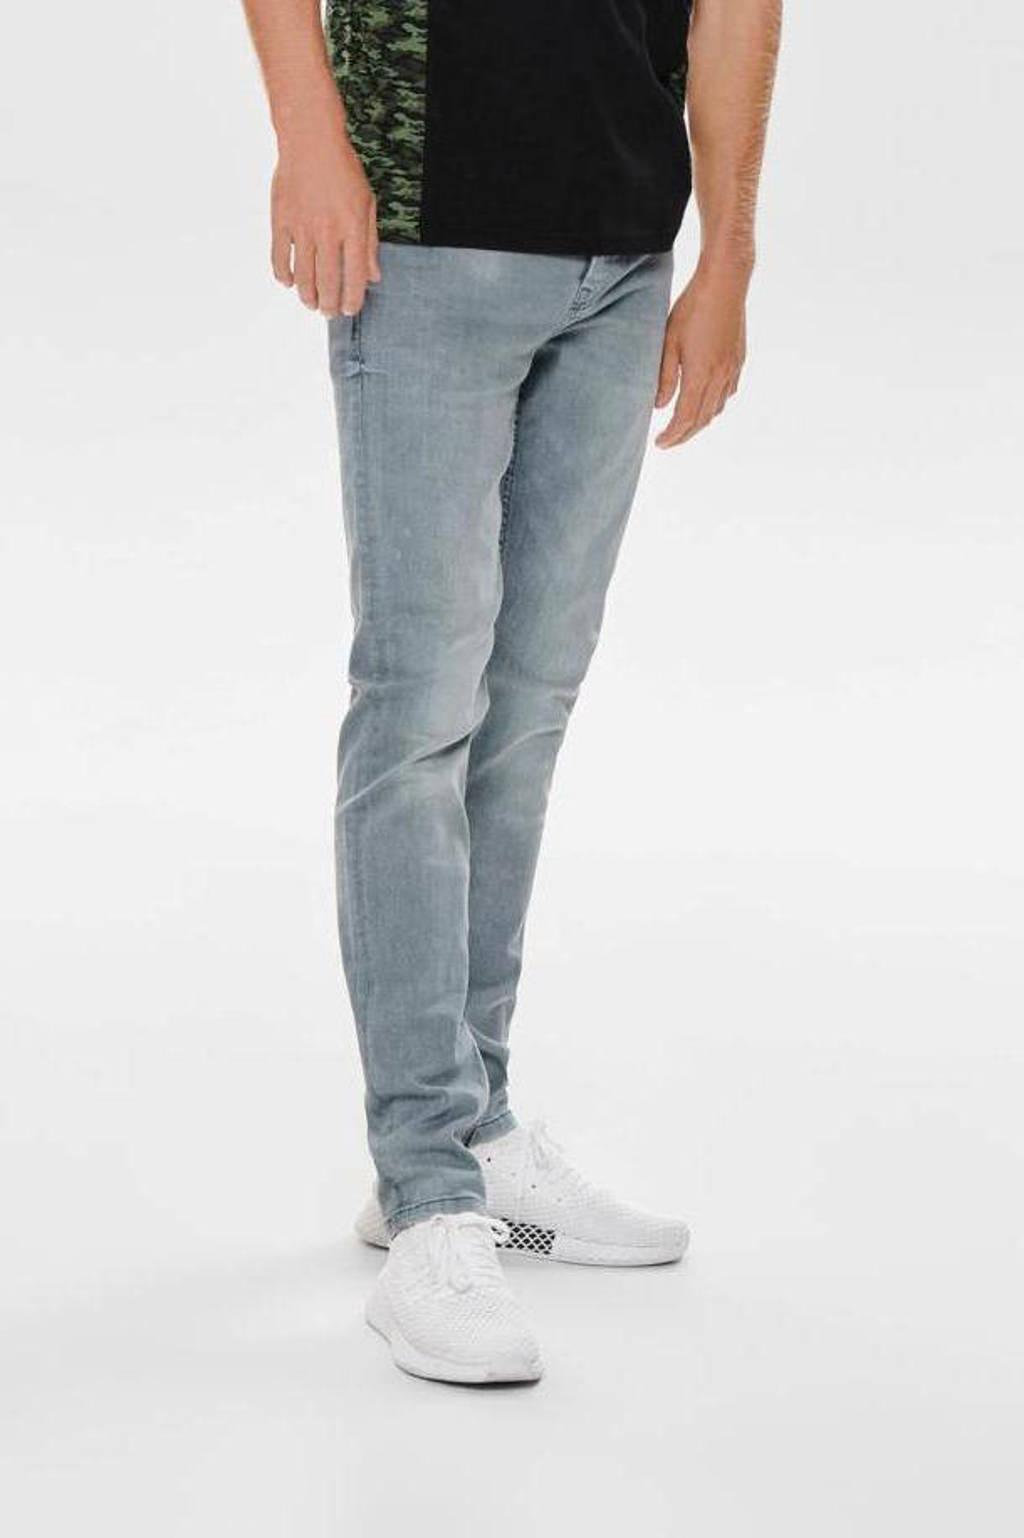 ONLY & SONS slim fit jeans ONSLOOM grey denim 3627, Grey Denim 3627